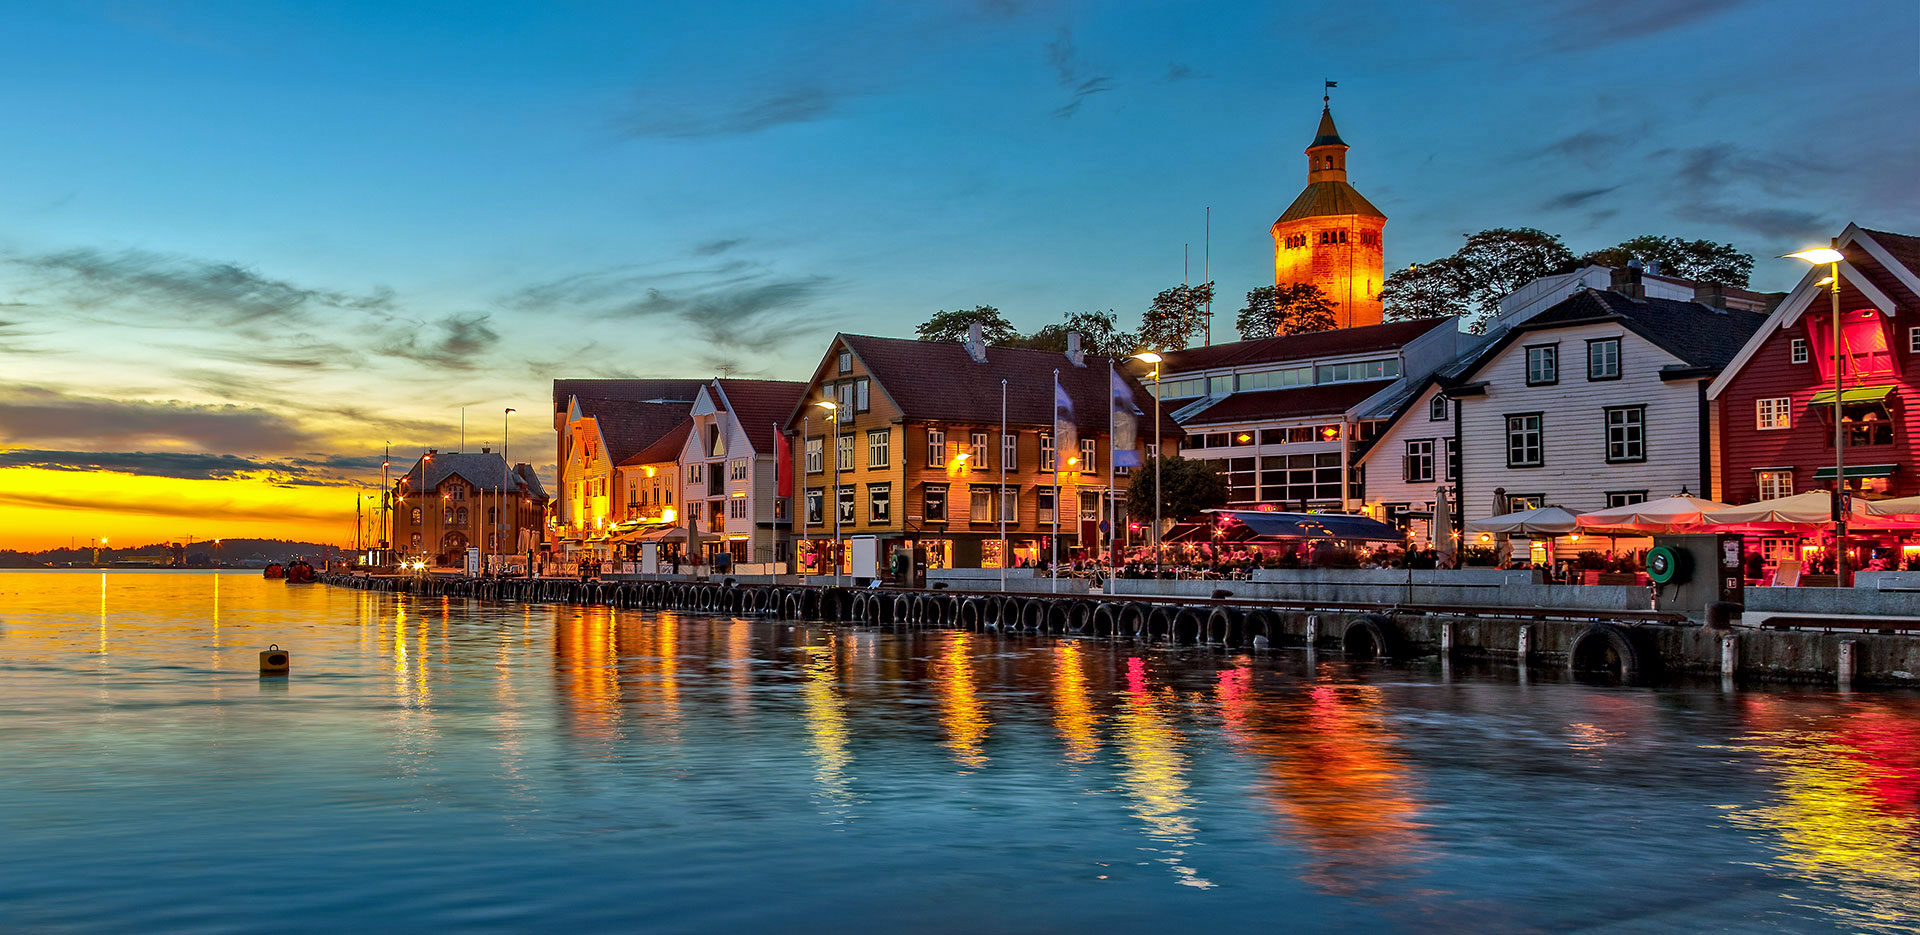 Risultati immagini per Stavanger